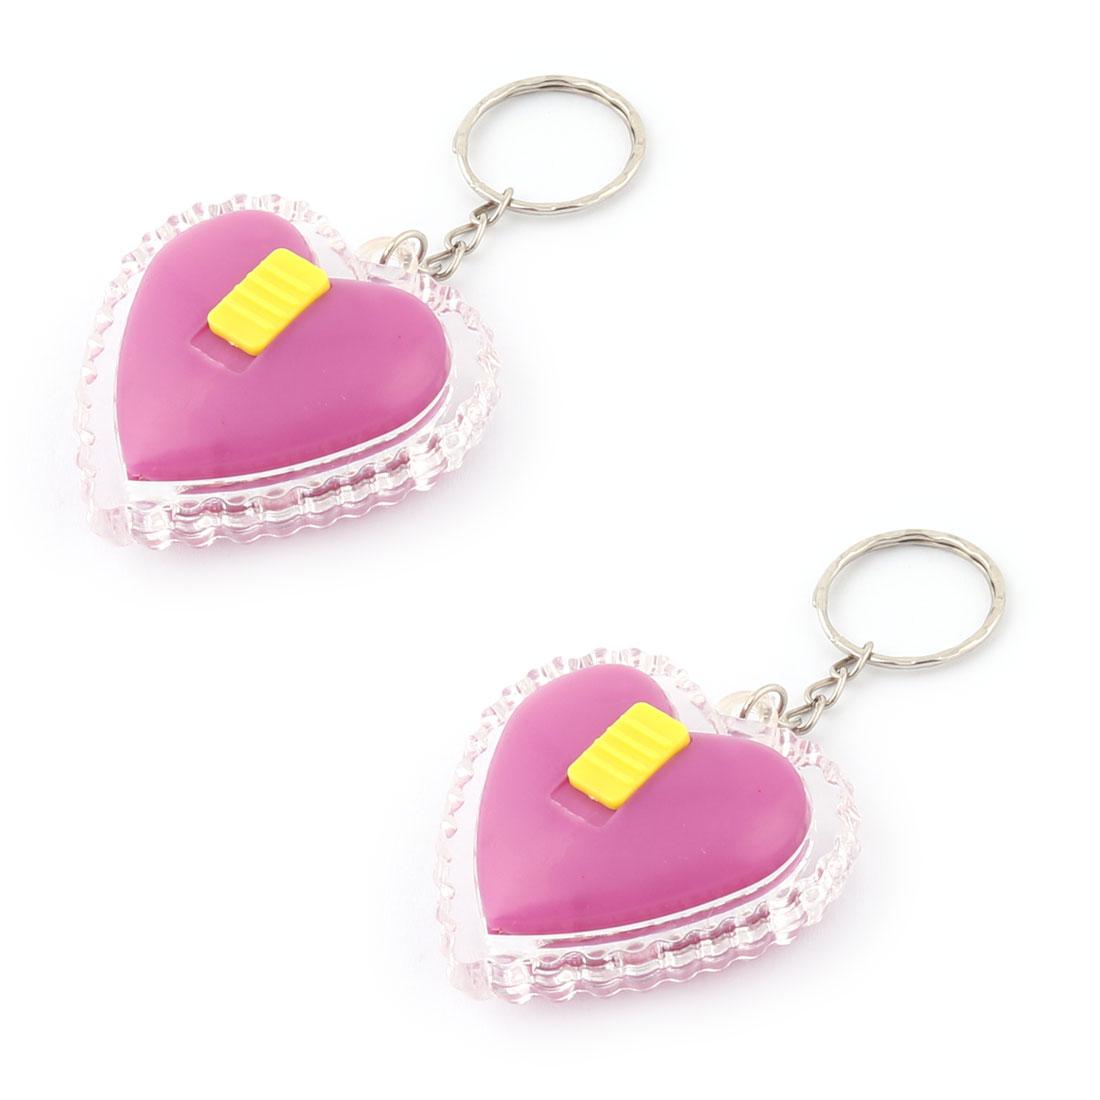 Lady Women Plastic Heart Pendant Metal Chain Key Ring Holder Bag Decoration Purple 2pcs